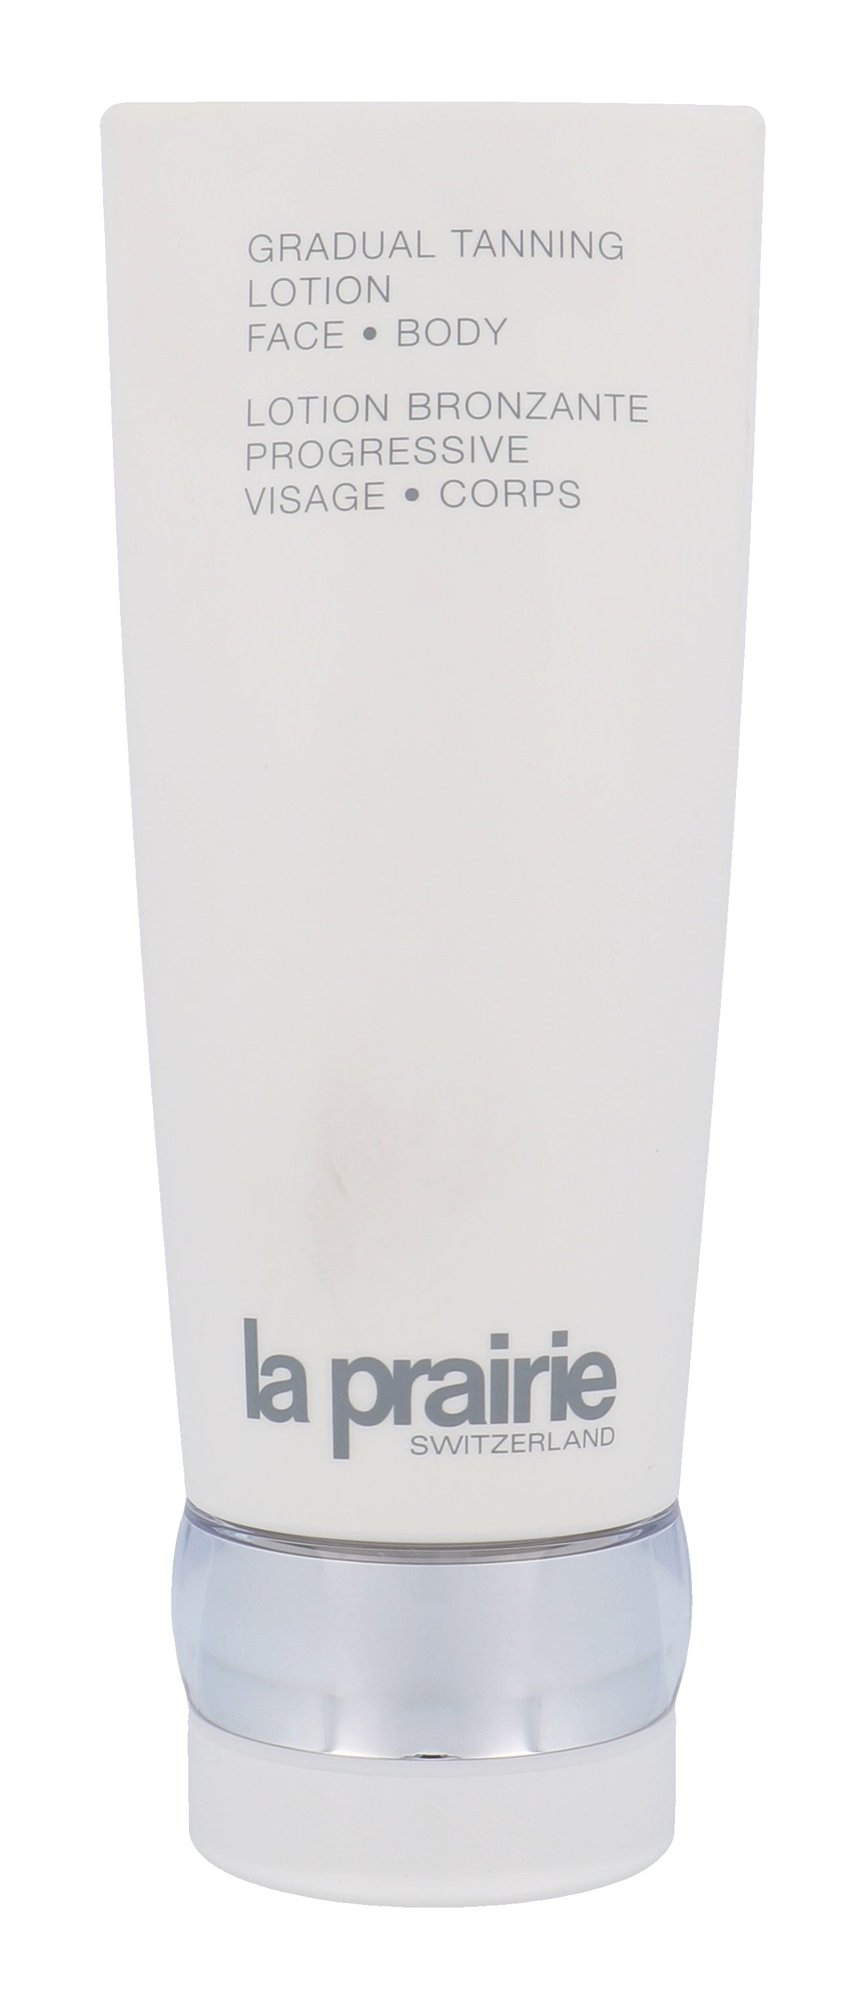 La Prairie Gradual Tanning Cosmetic 180ml